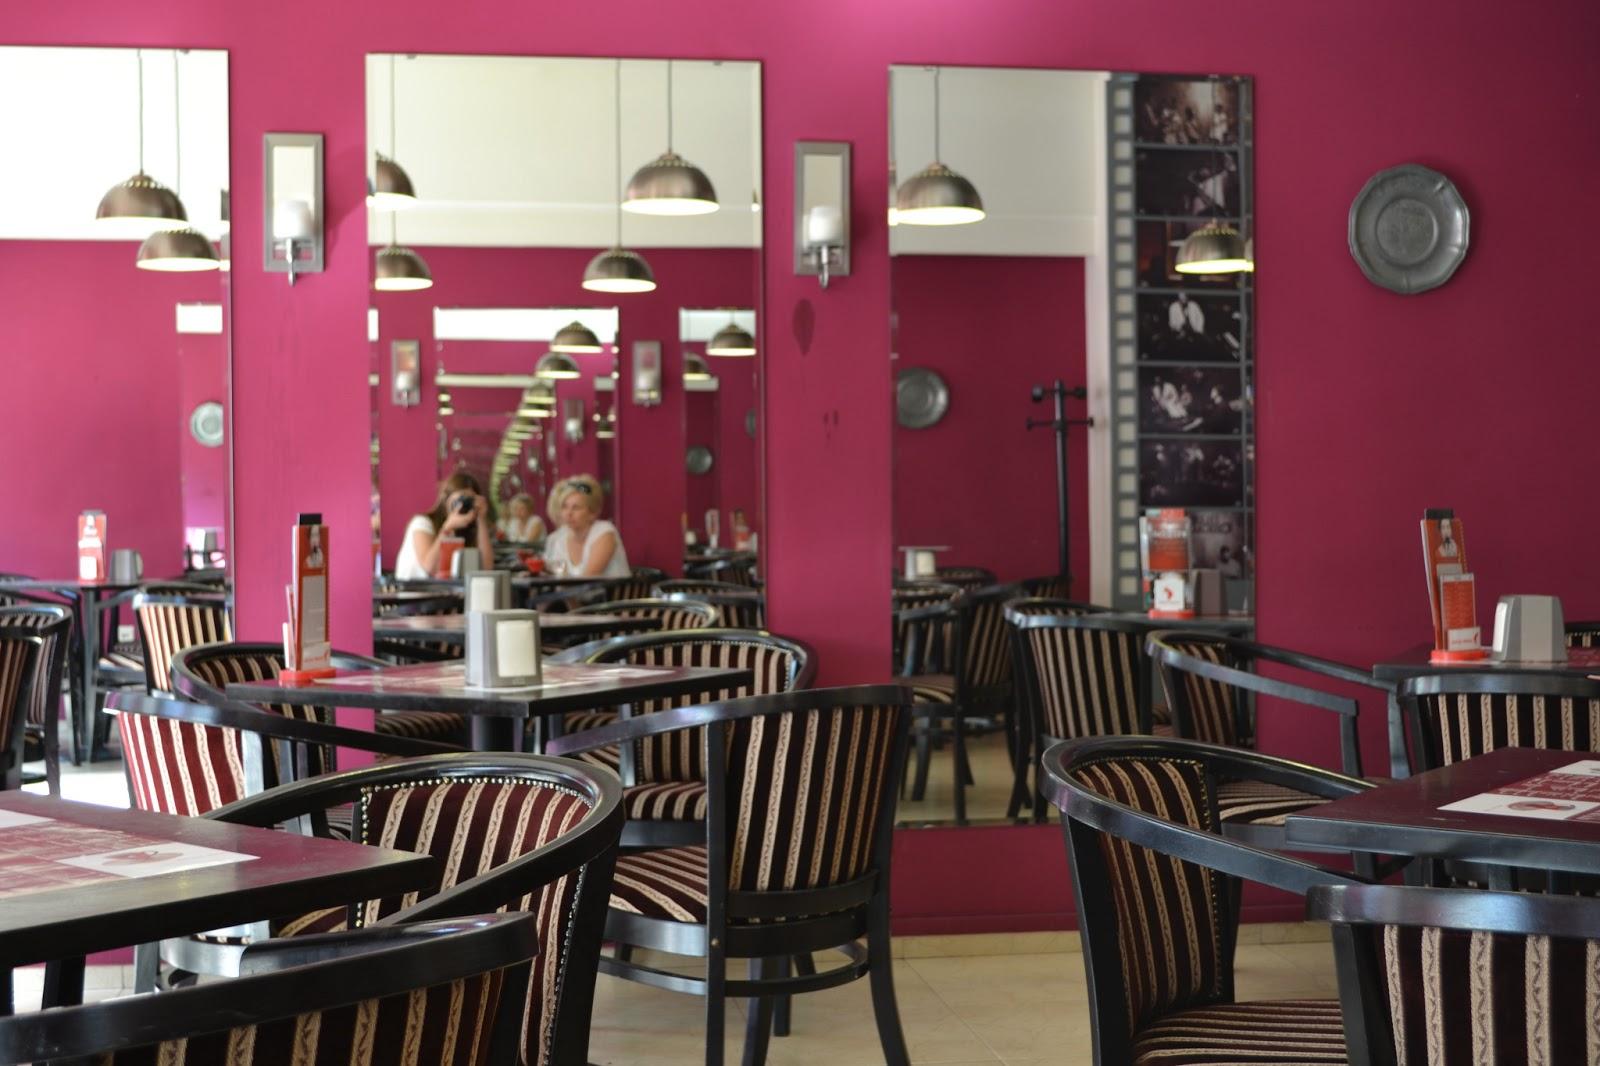 cafenea bizz cafe interior design oglinzi, mobilier